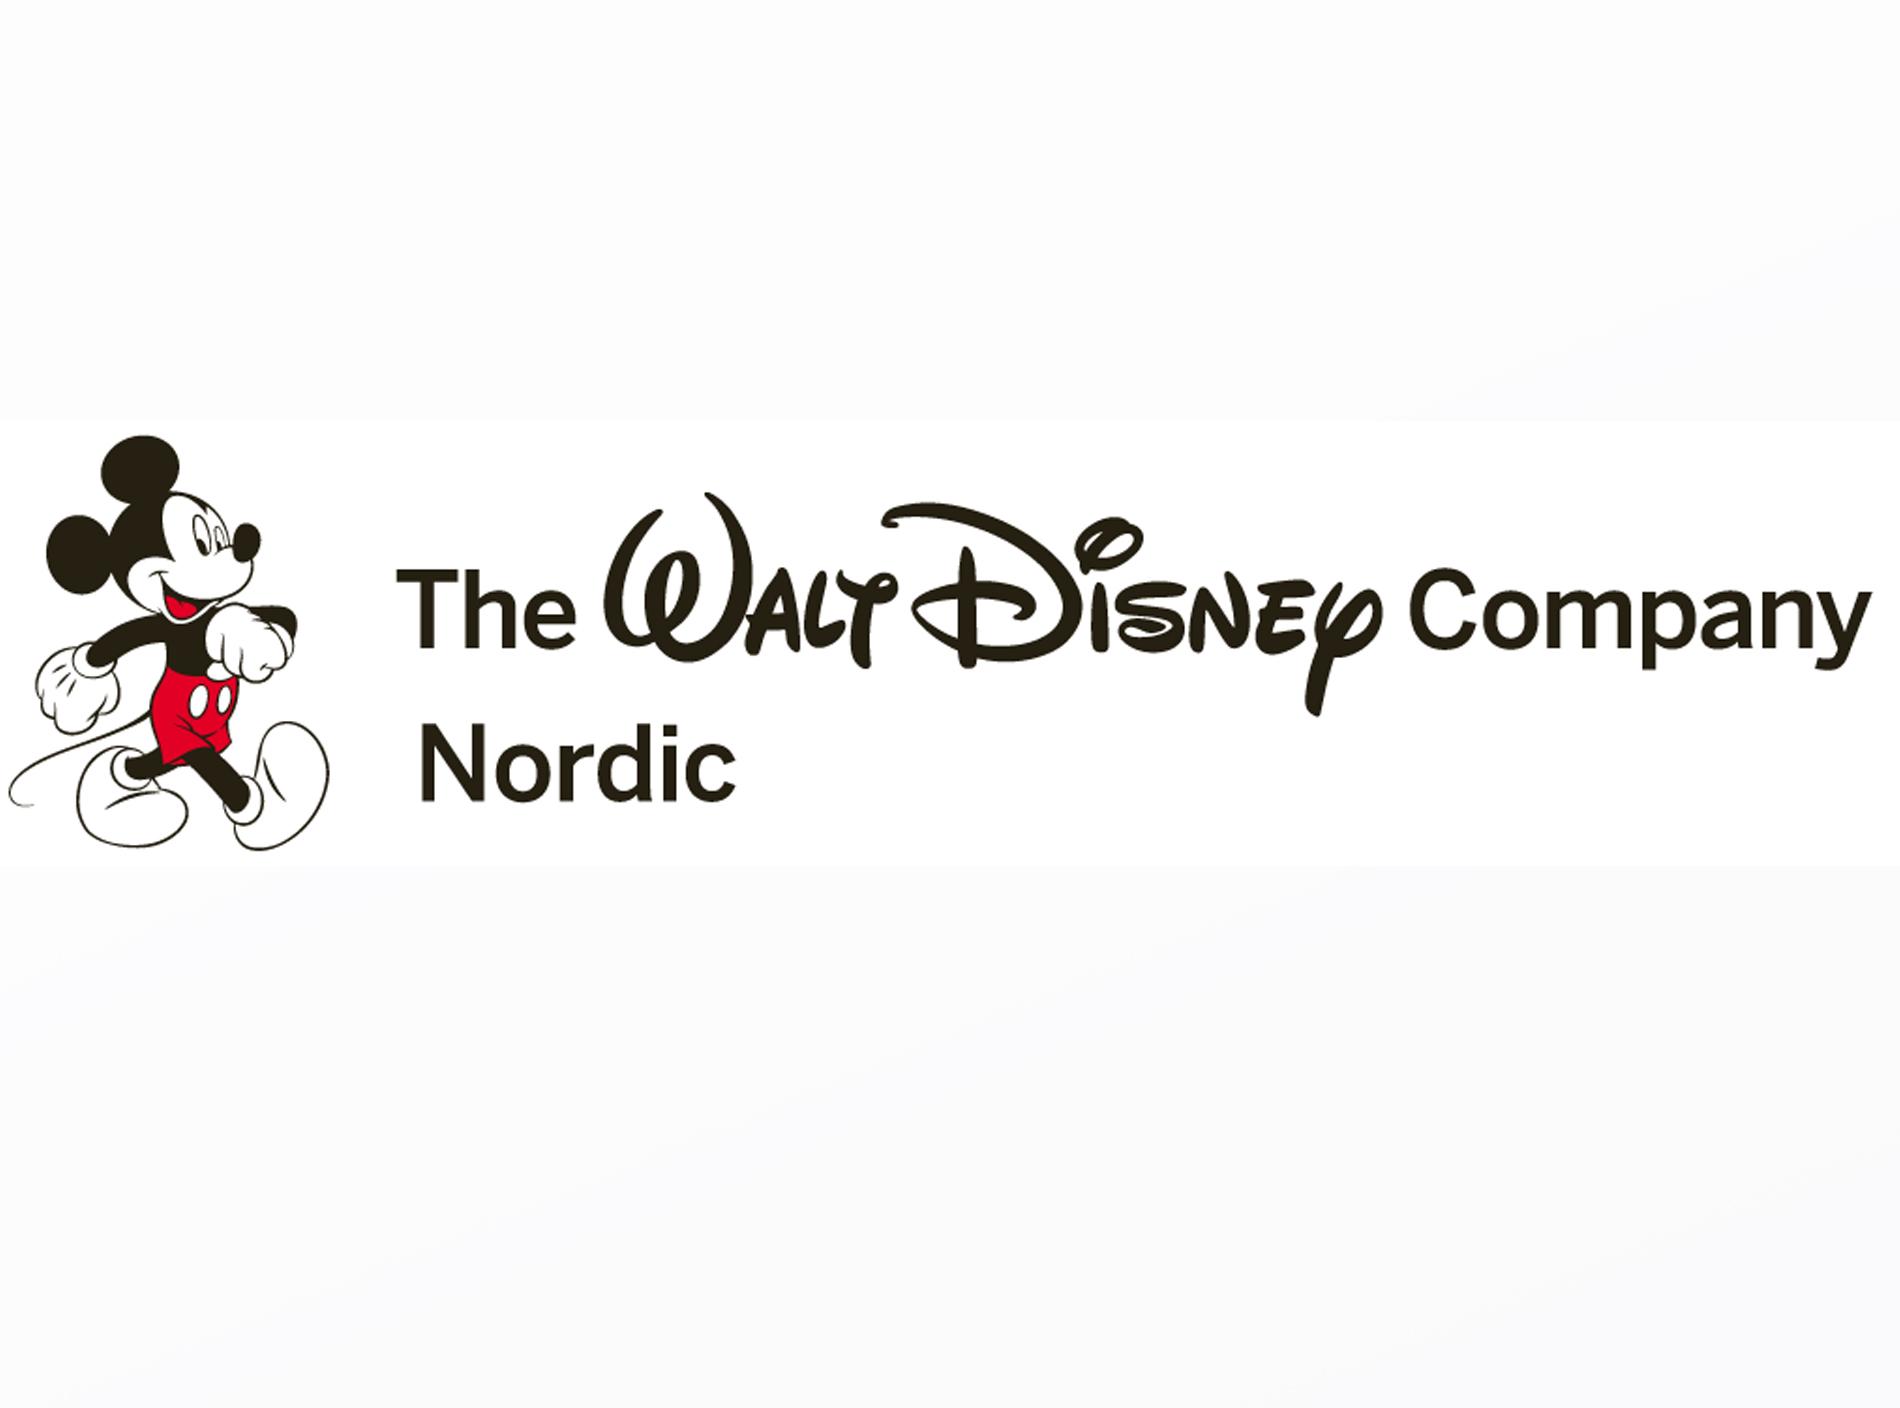 Walt disney company pictures to pin on pinterest the walt disney company symbol biocorpaavc Choice Image